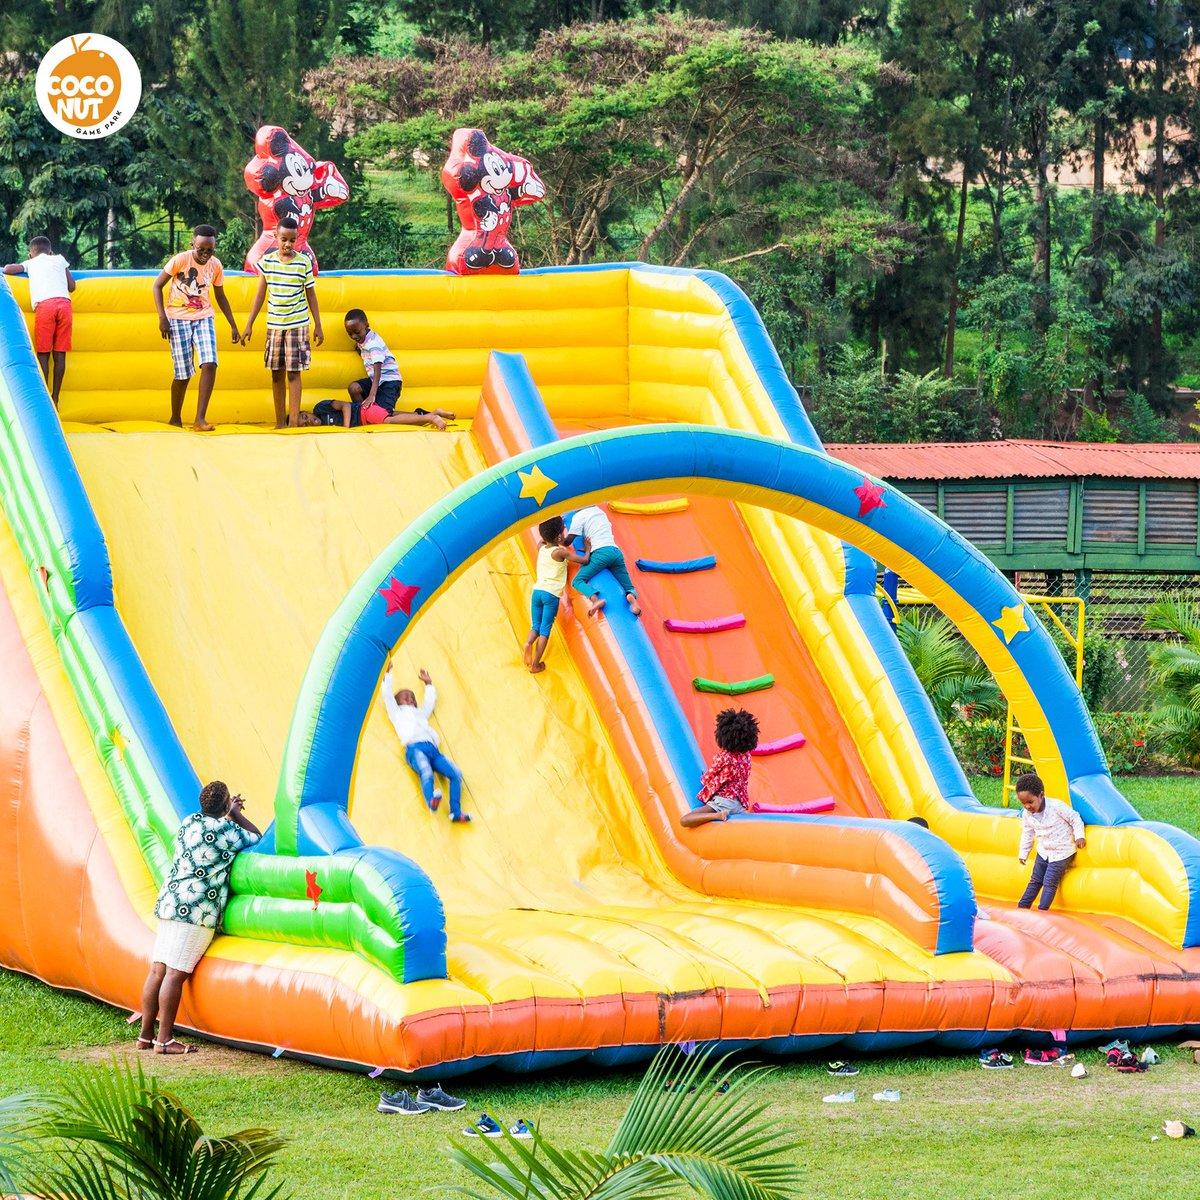 Coconut Game Park kigali (@coconutgamepark) | Twitter